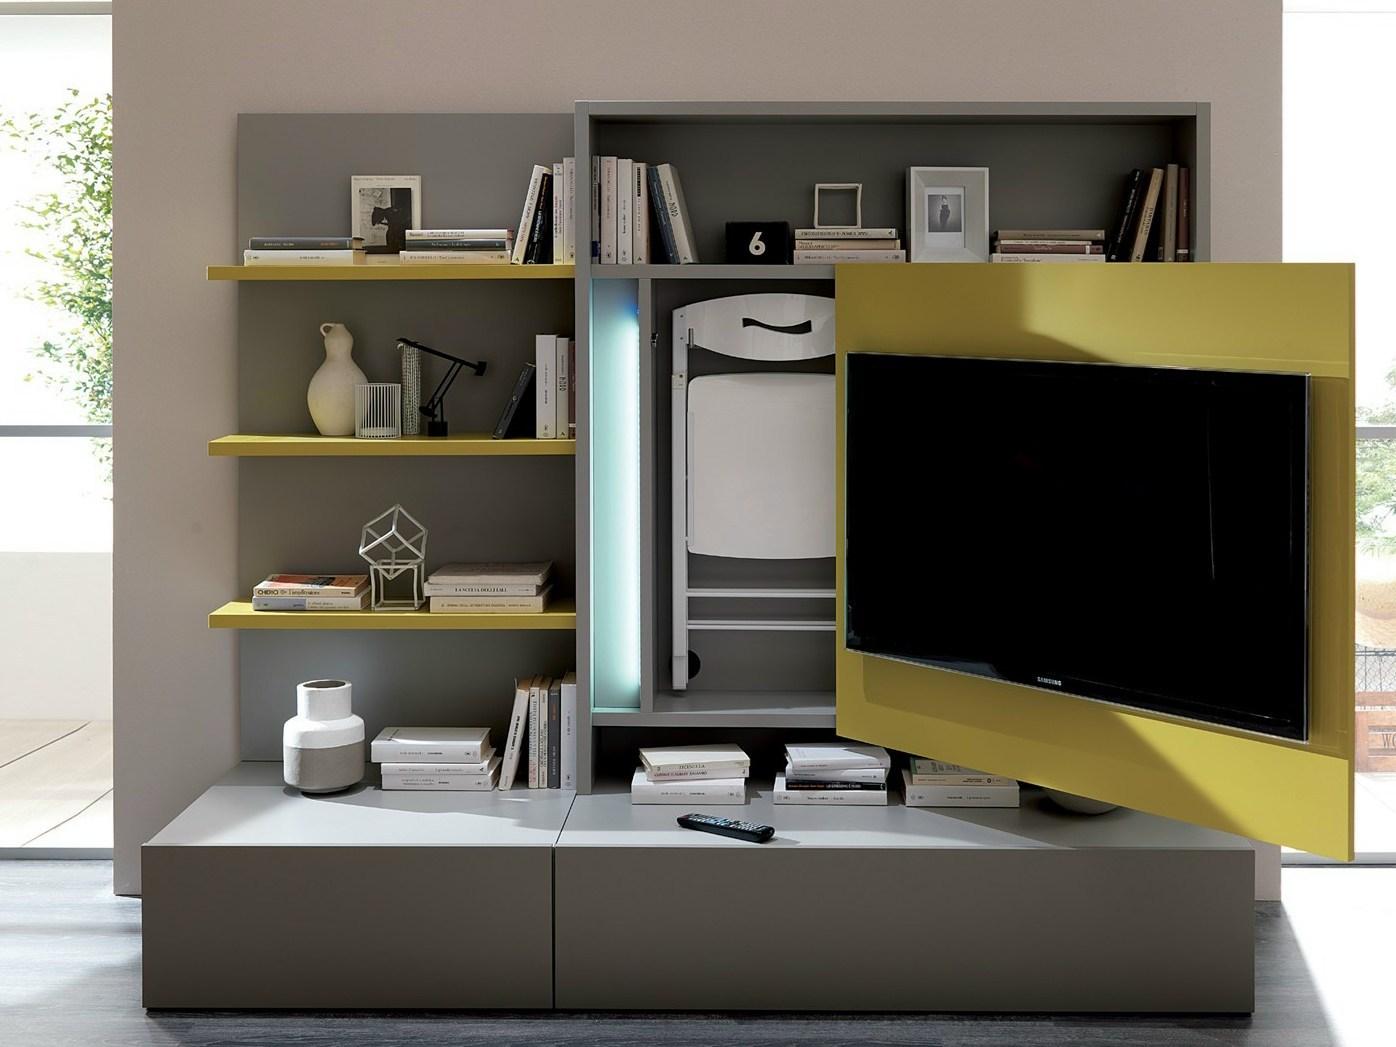 Как задекорировать провод от телевизора на стене своими руками фото 696